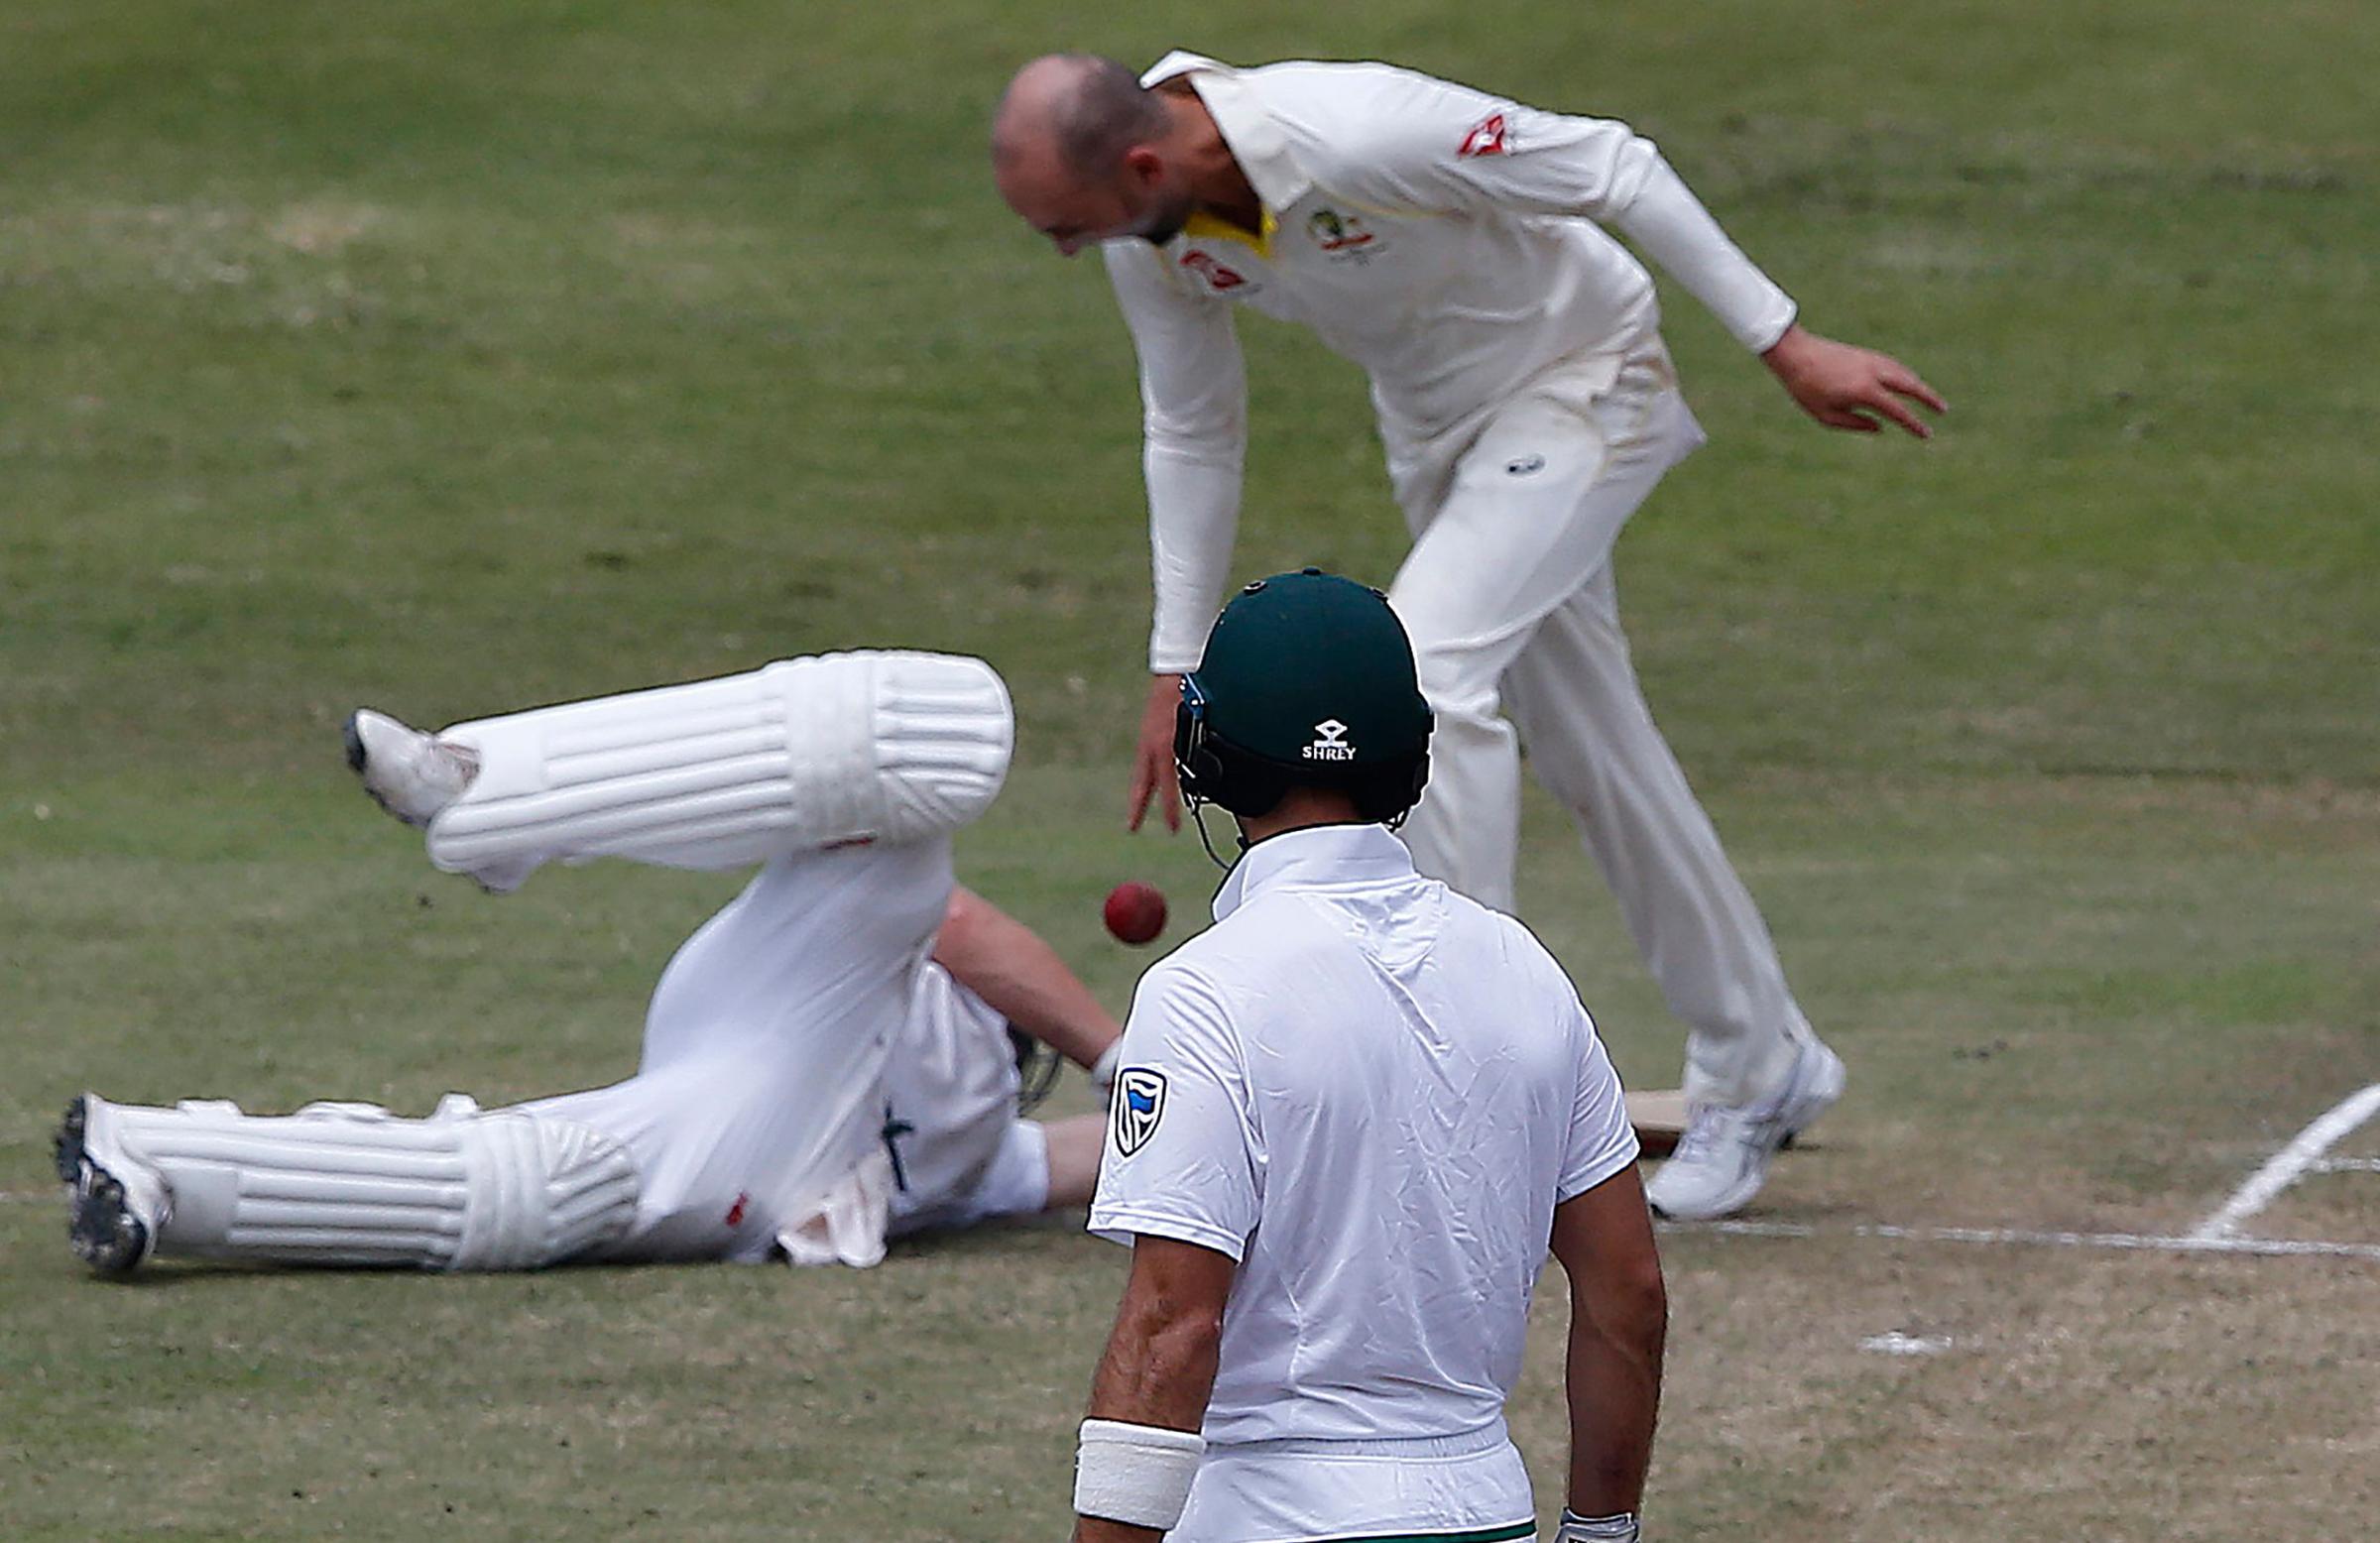 Lyon drops the ball after de Villiers' run out // Getty